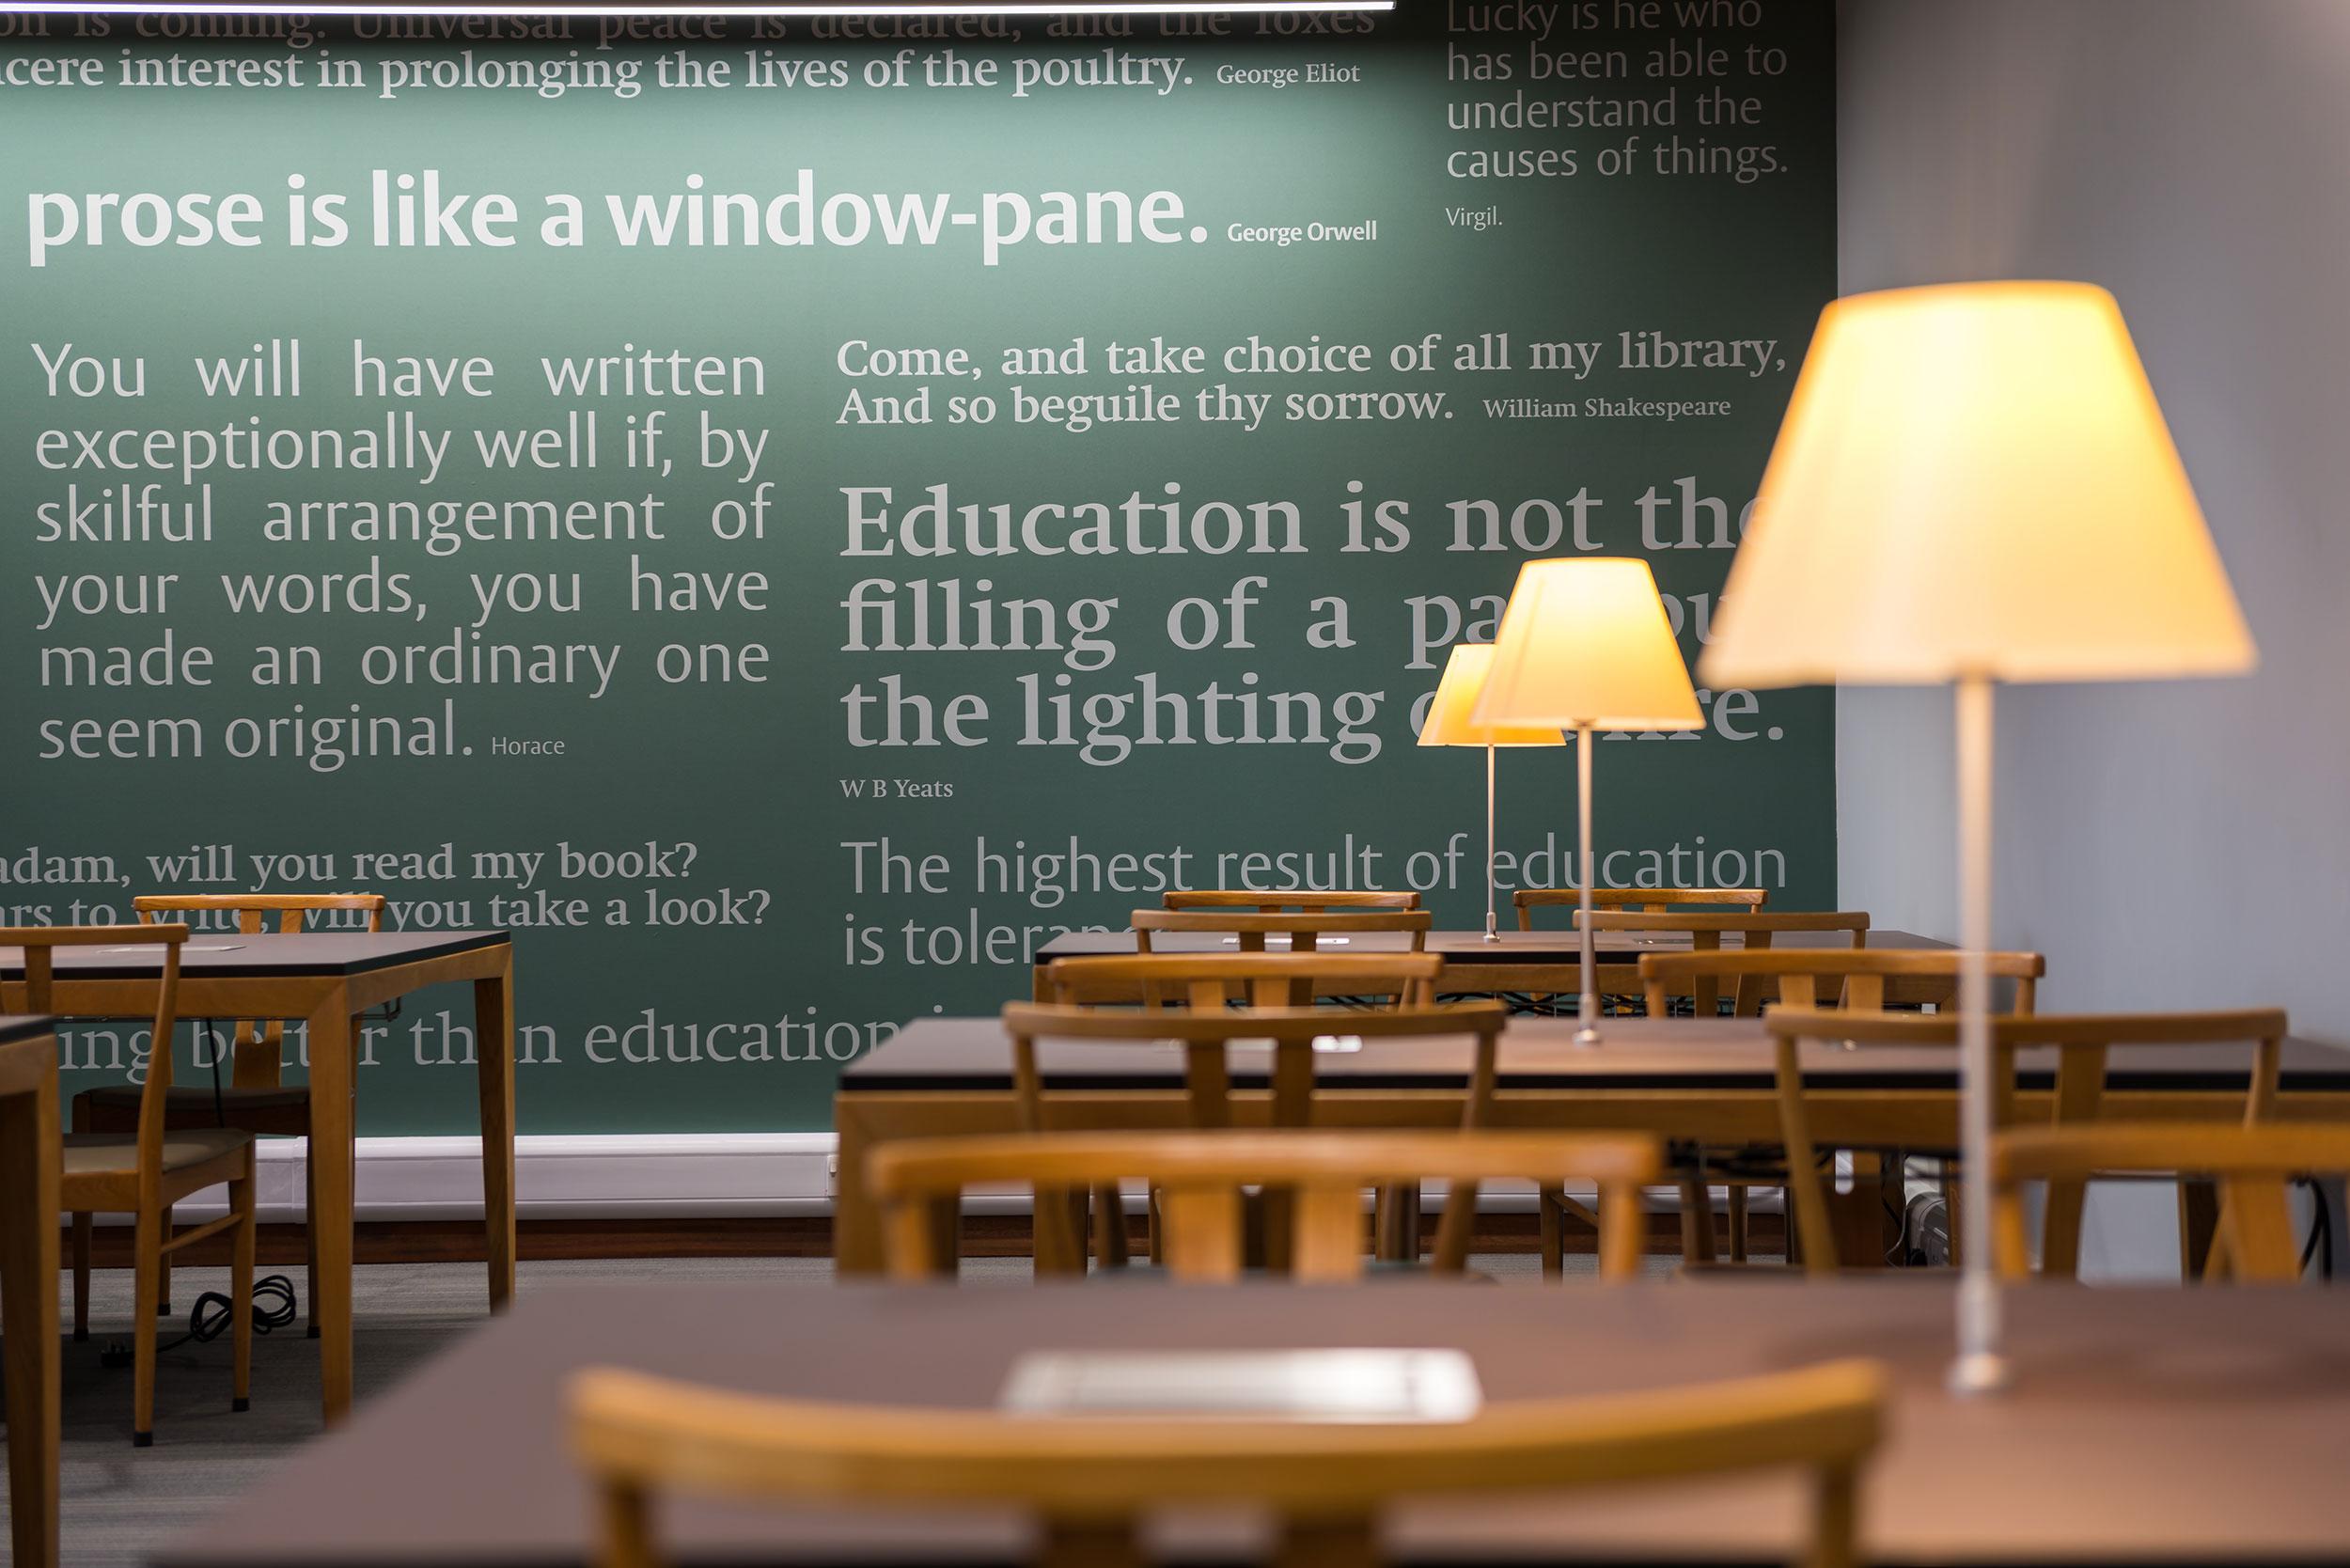 University_of_Reading_Library_Story_Photography_109.jpg